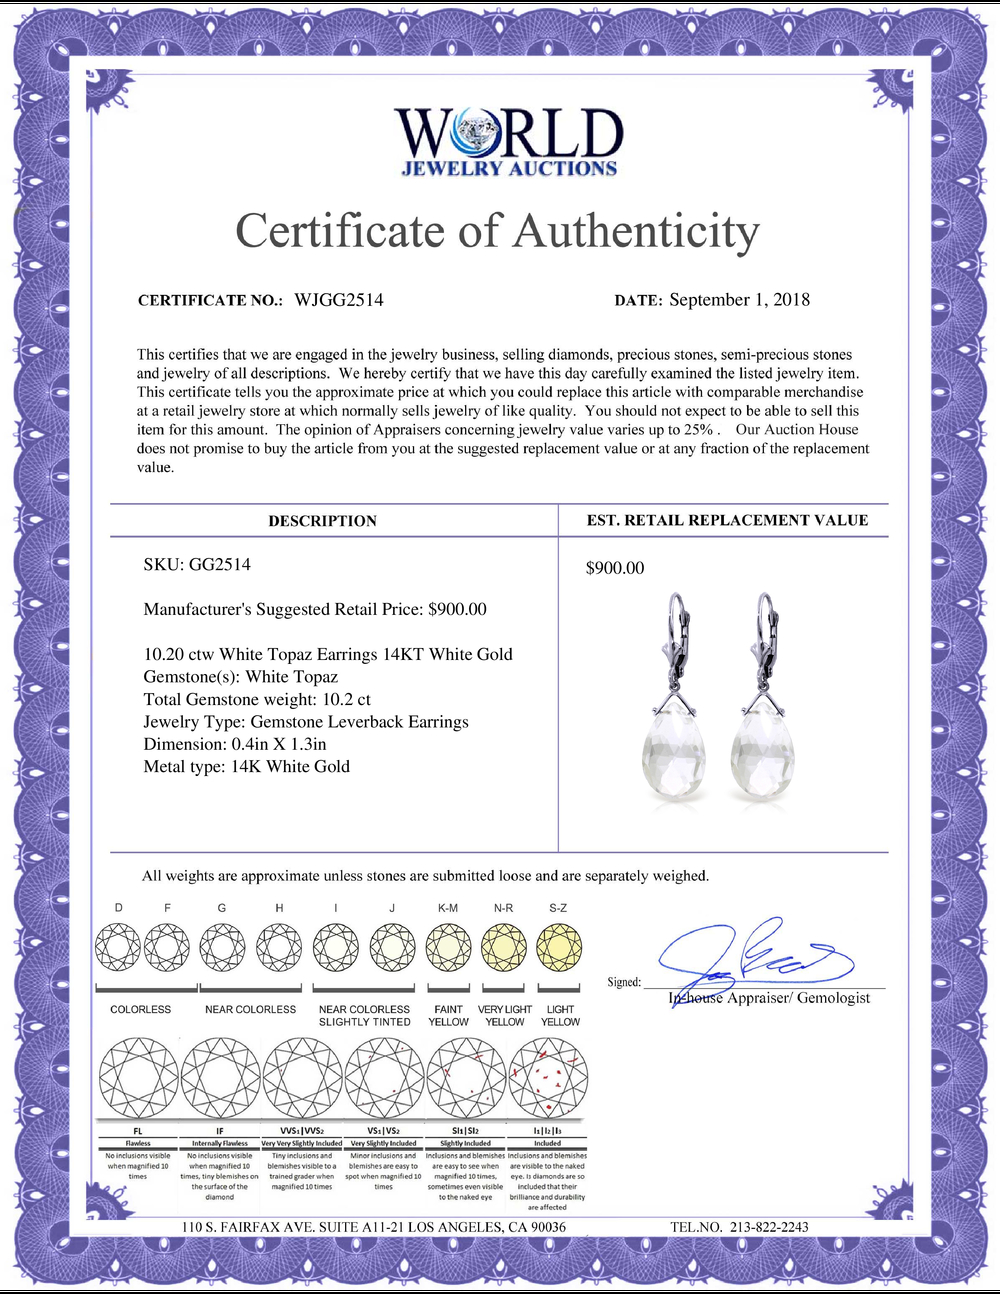 Lot 3084: Genuine 10.20 ctw White Topaz Earrings Jewelry 14KT Rose Gold - REF-28R9P